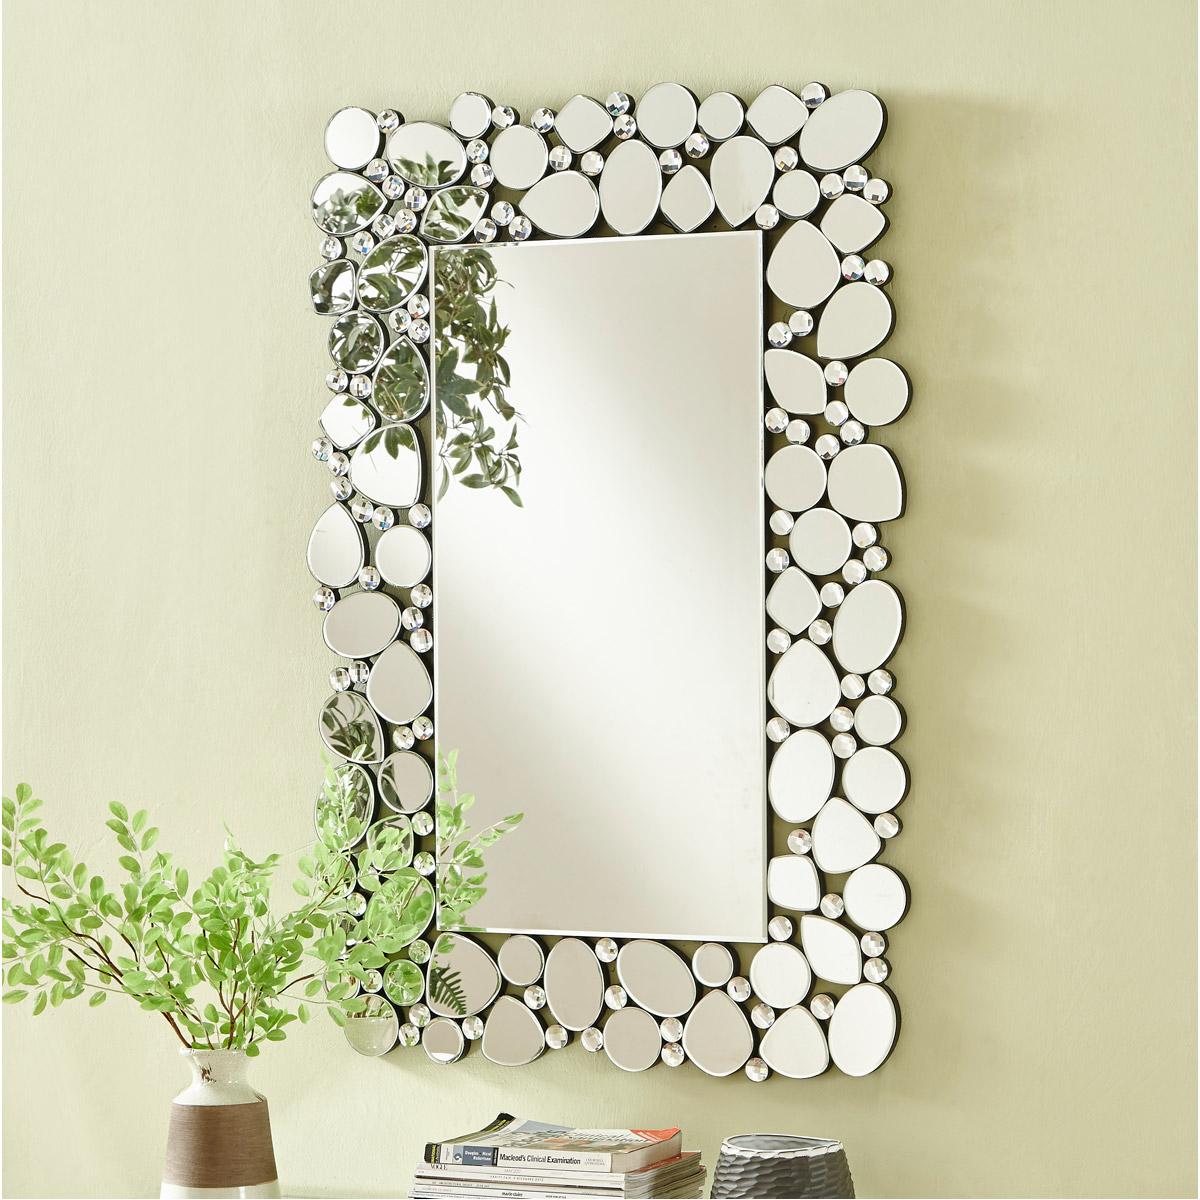 Details about WALL MIRROR MODERN BEDROOM BATHROOM VANITY HALLWAY DINING  LIVING ROOM FOYER 47\